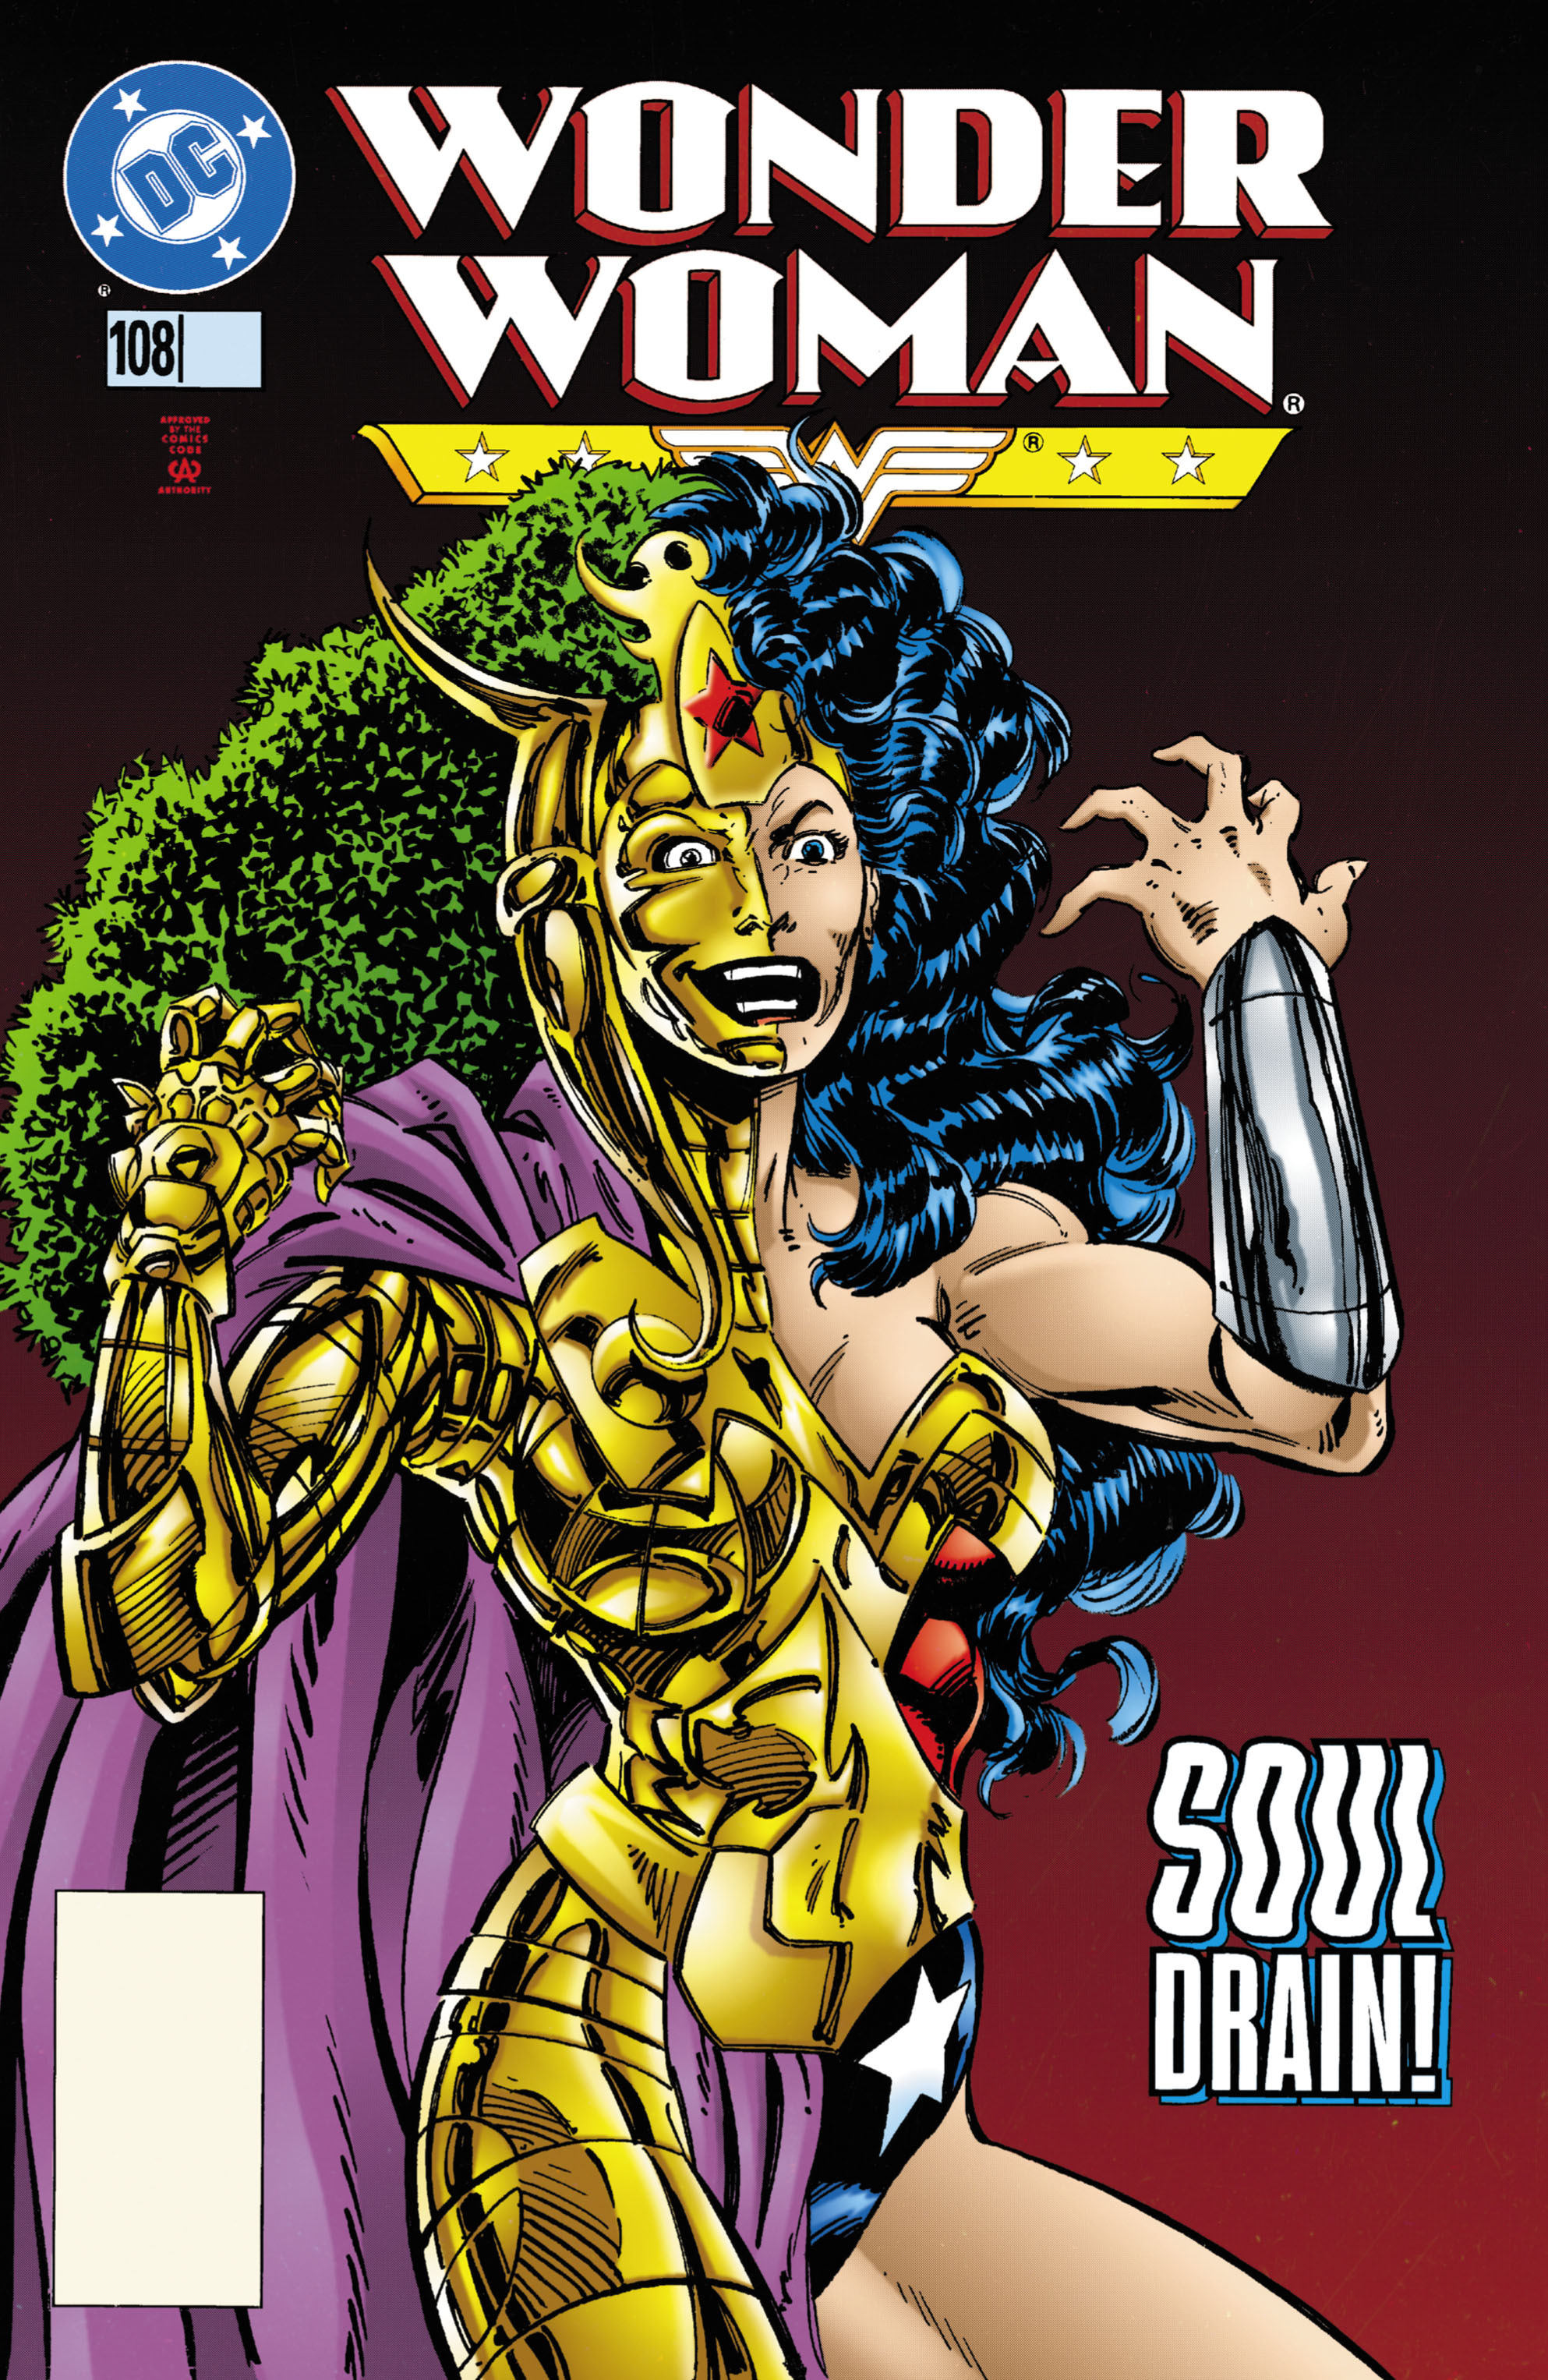 Read online Wonder Woman (1987) comic -  Issue #108 - 1